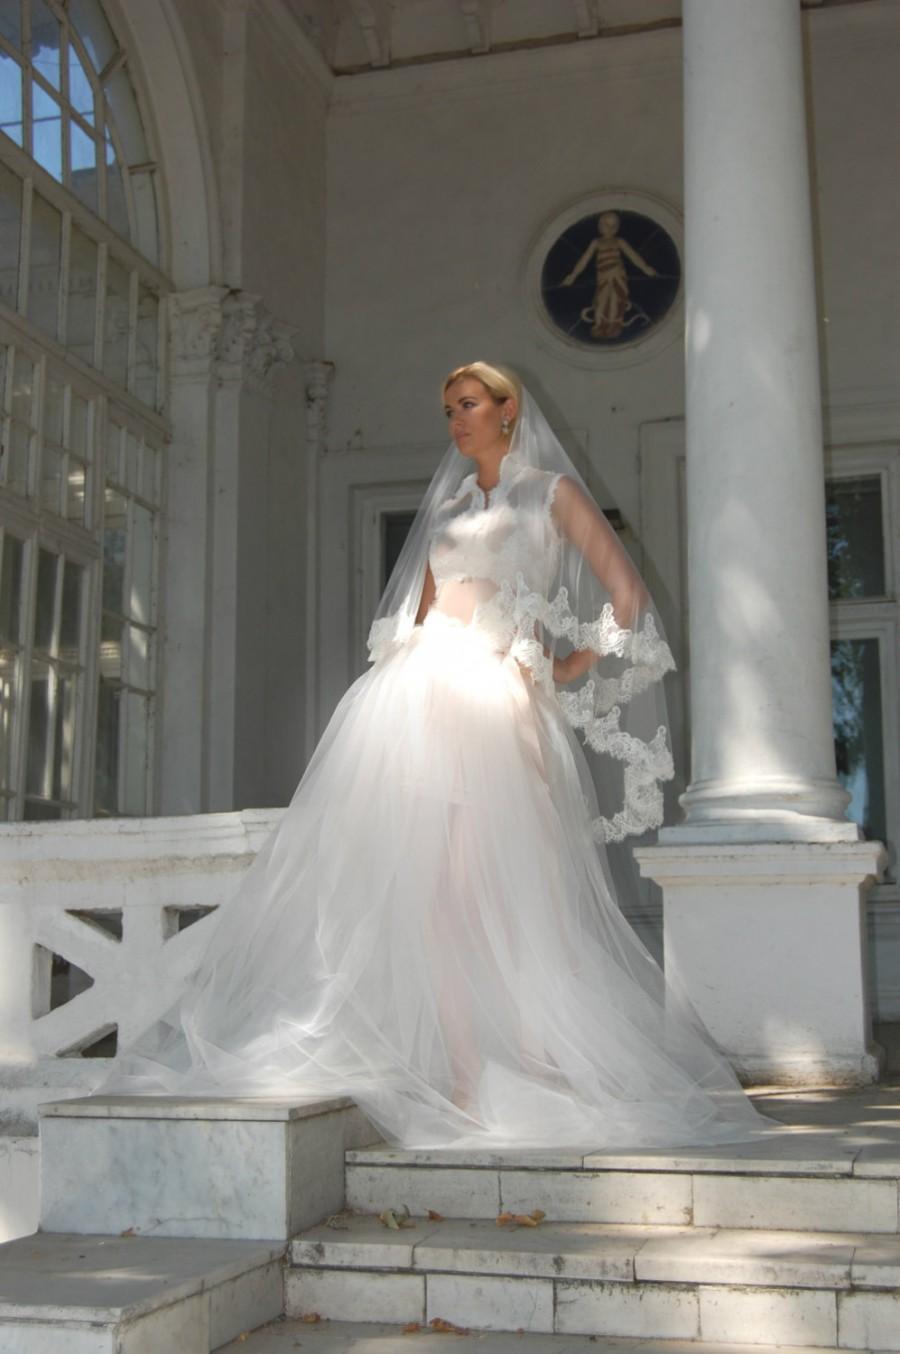 Hochzeit - Lace veil, ivory lace veil, wedding veil,veils,blusher veil, cathedral veil,chapel veil, STYLE 045 JULIA